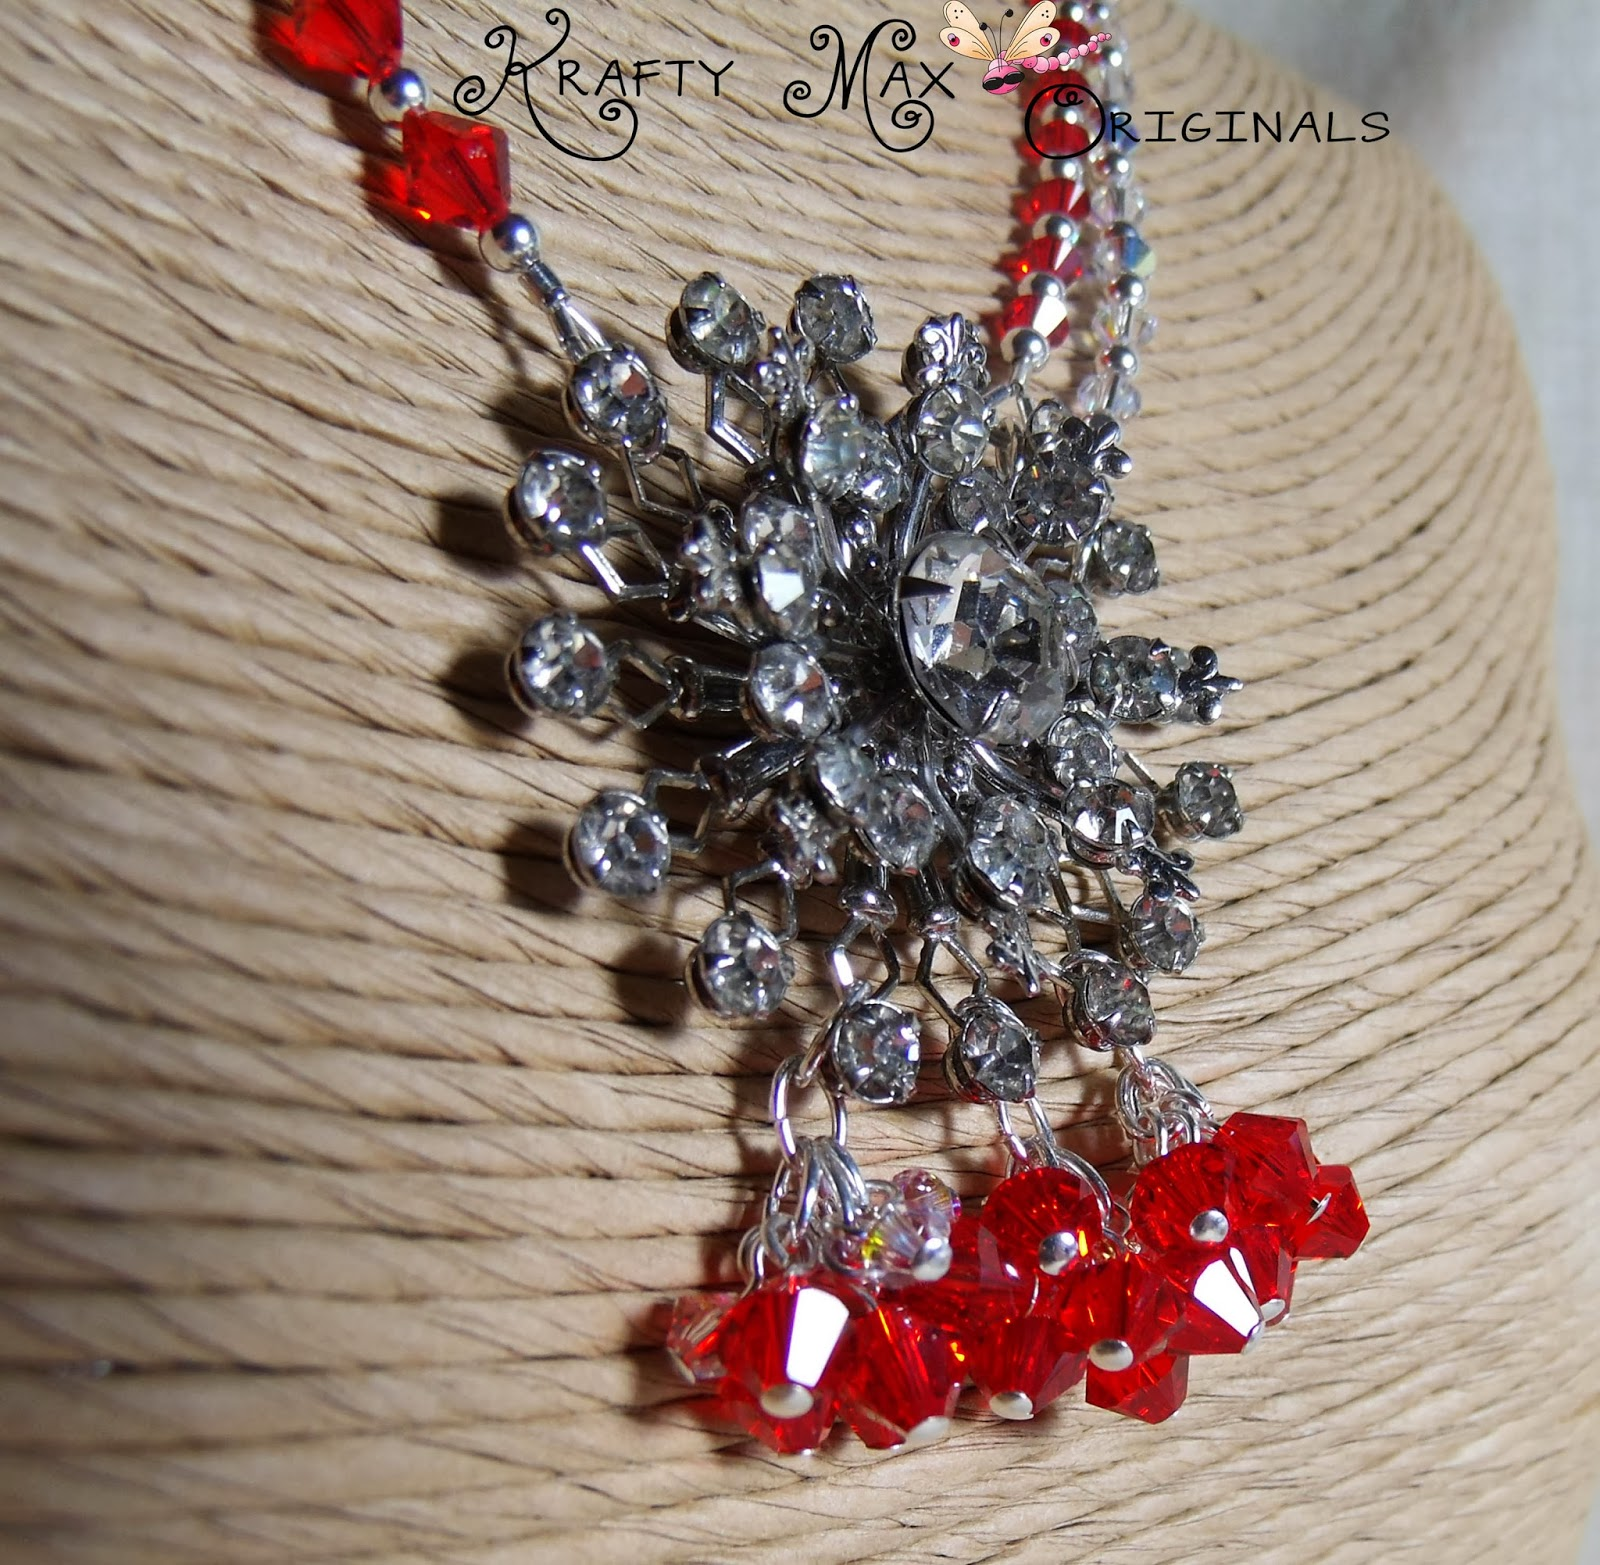 http://www.artfire.com/ext/shop/product_view/KraftyMax/4583522/Red_and_Swarovski_Crystal_StarBURST_Necklace_Set/Jewelry/Sets/Crystal